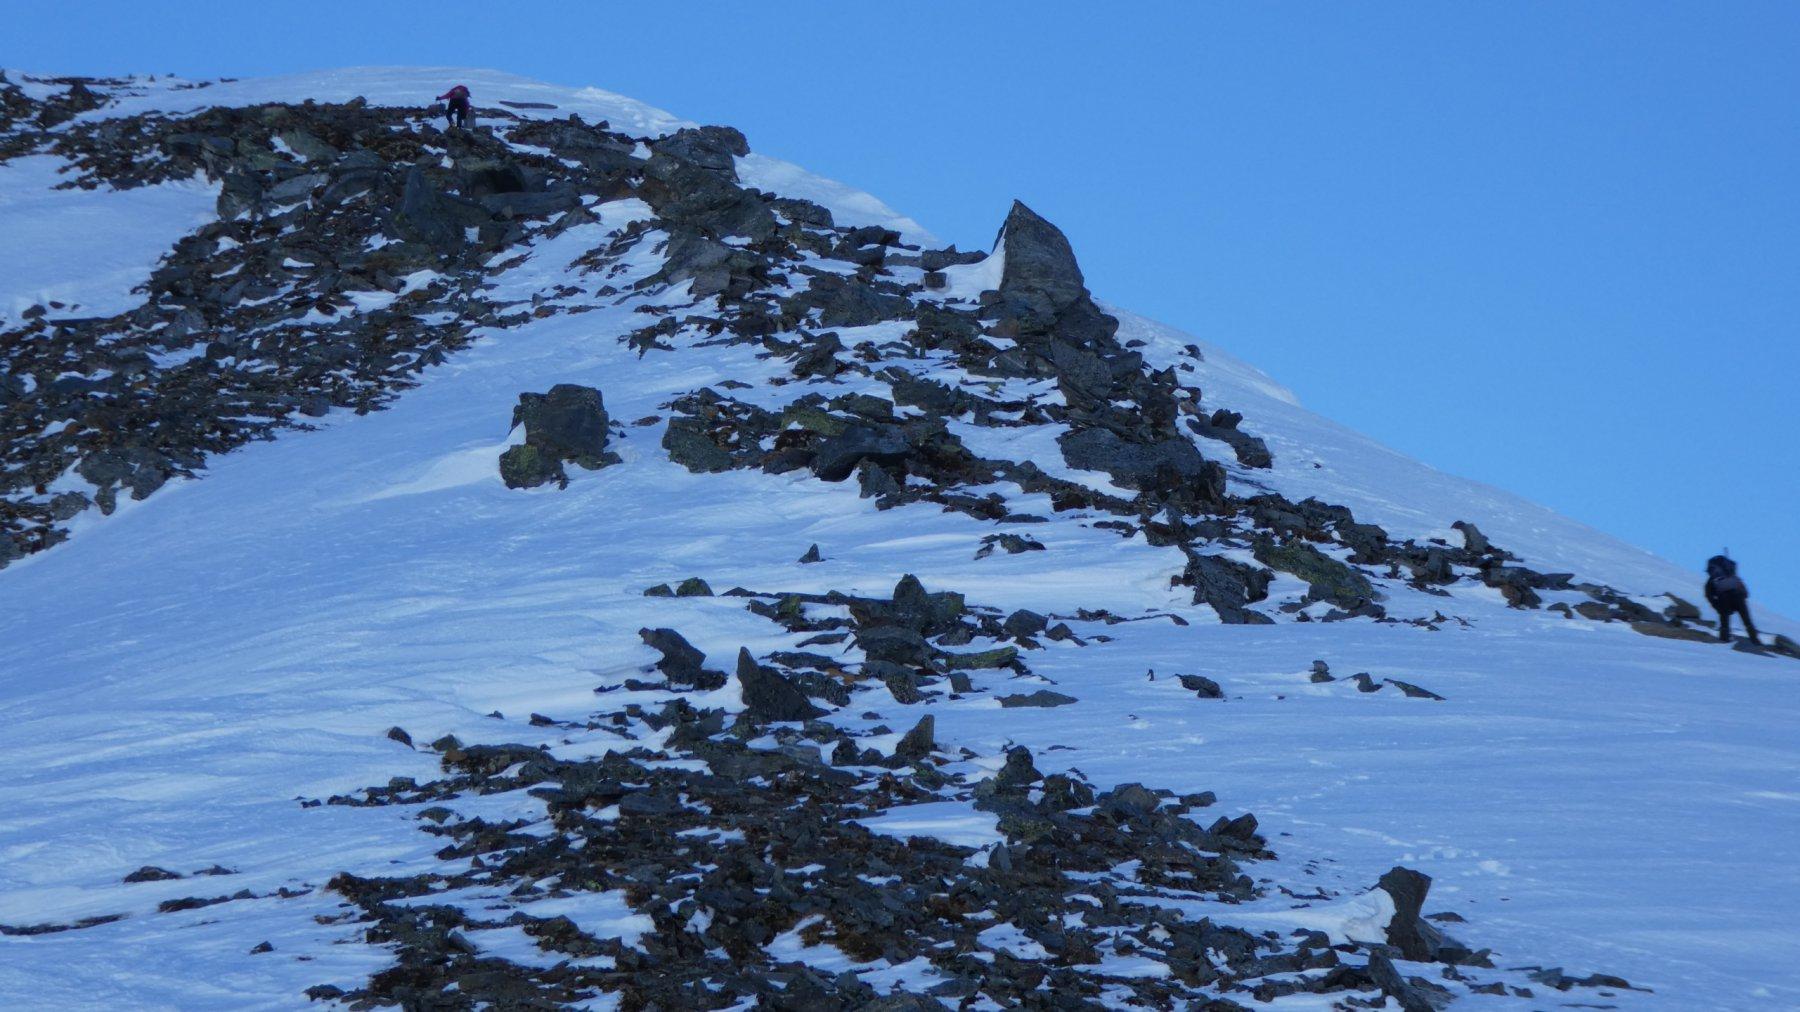 salendo lungo la cresta Nord del Sirwoltehorn...03